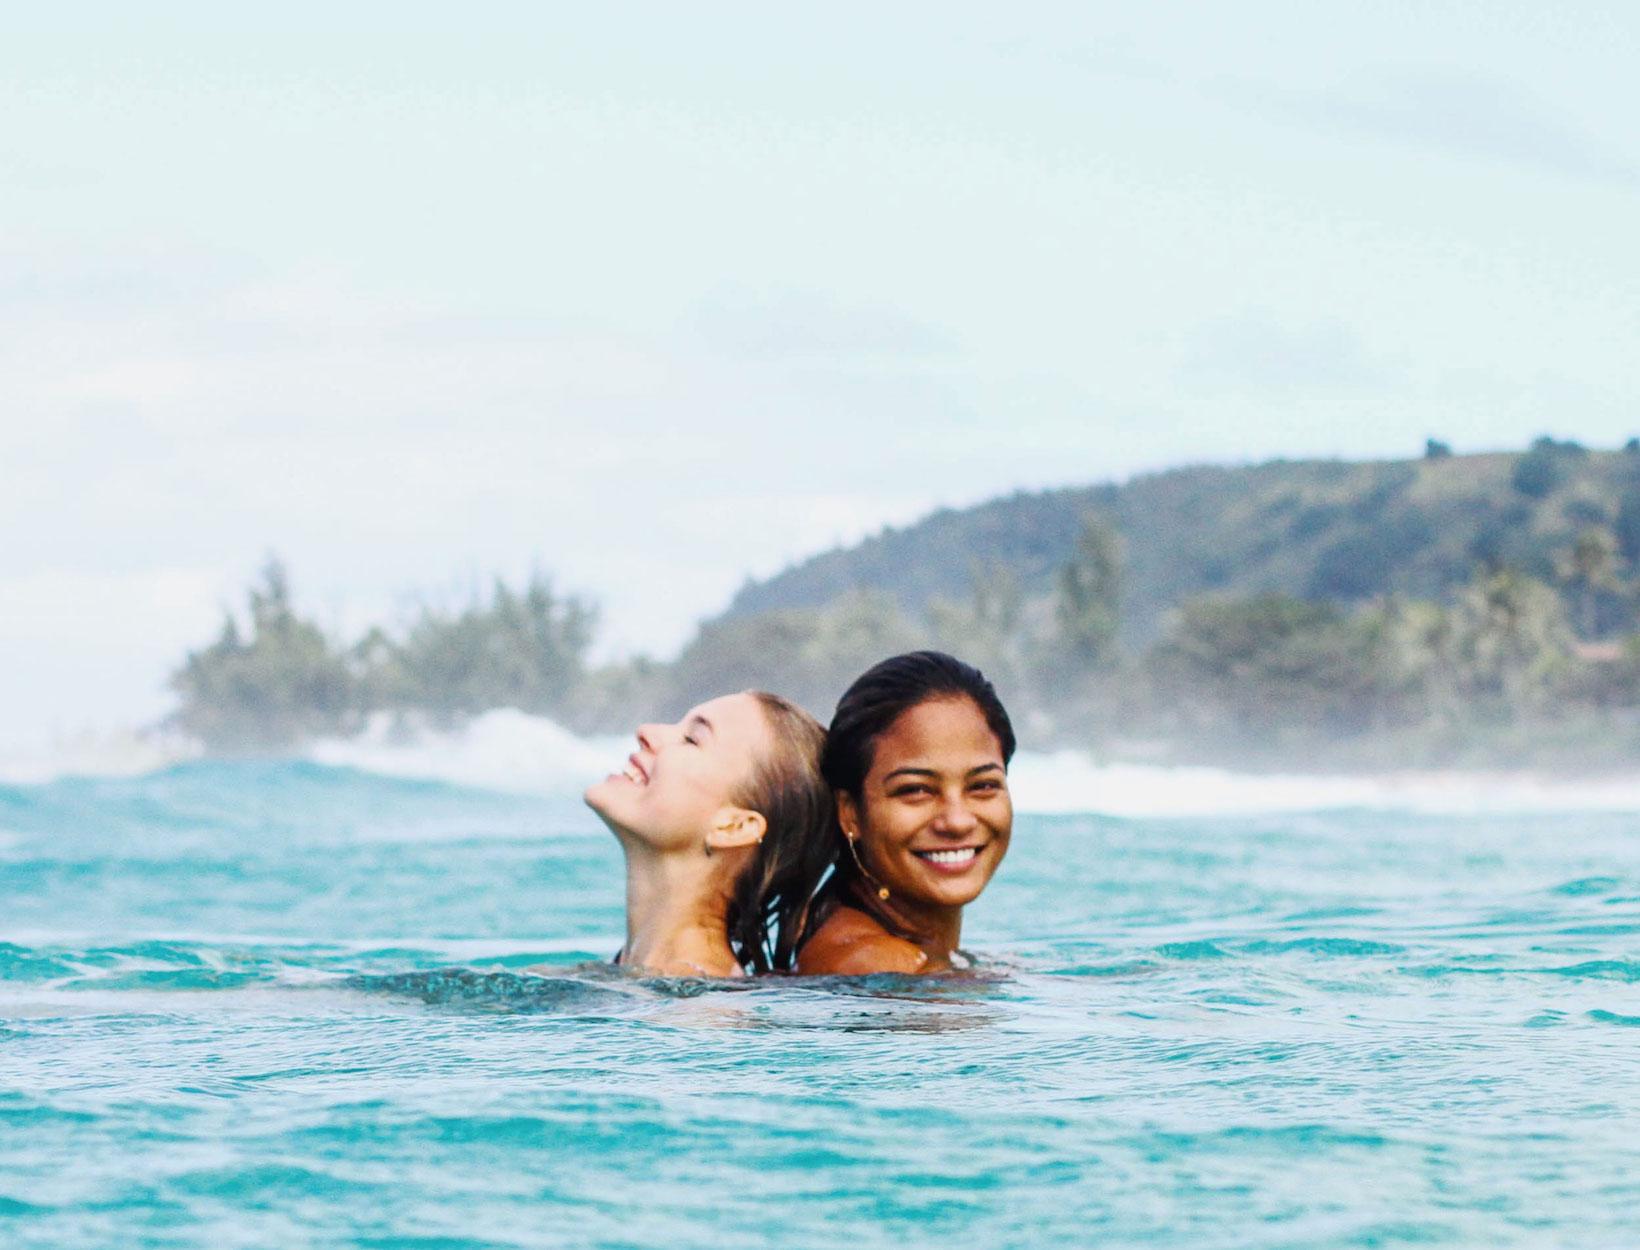 women swimming in the ocean